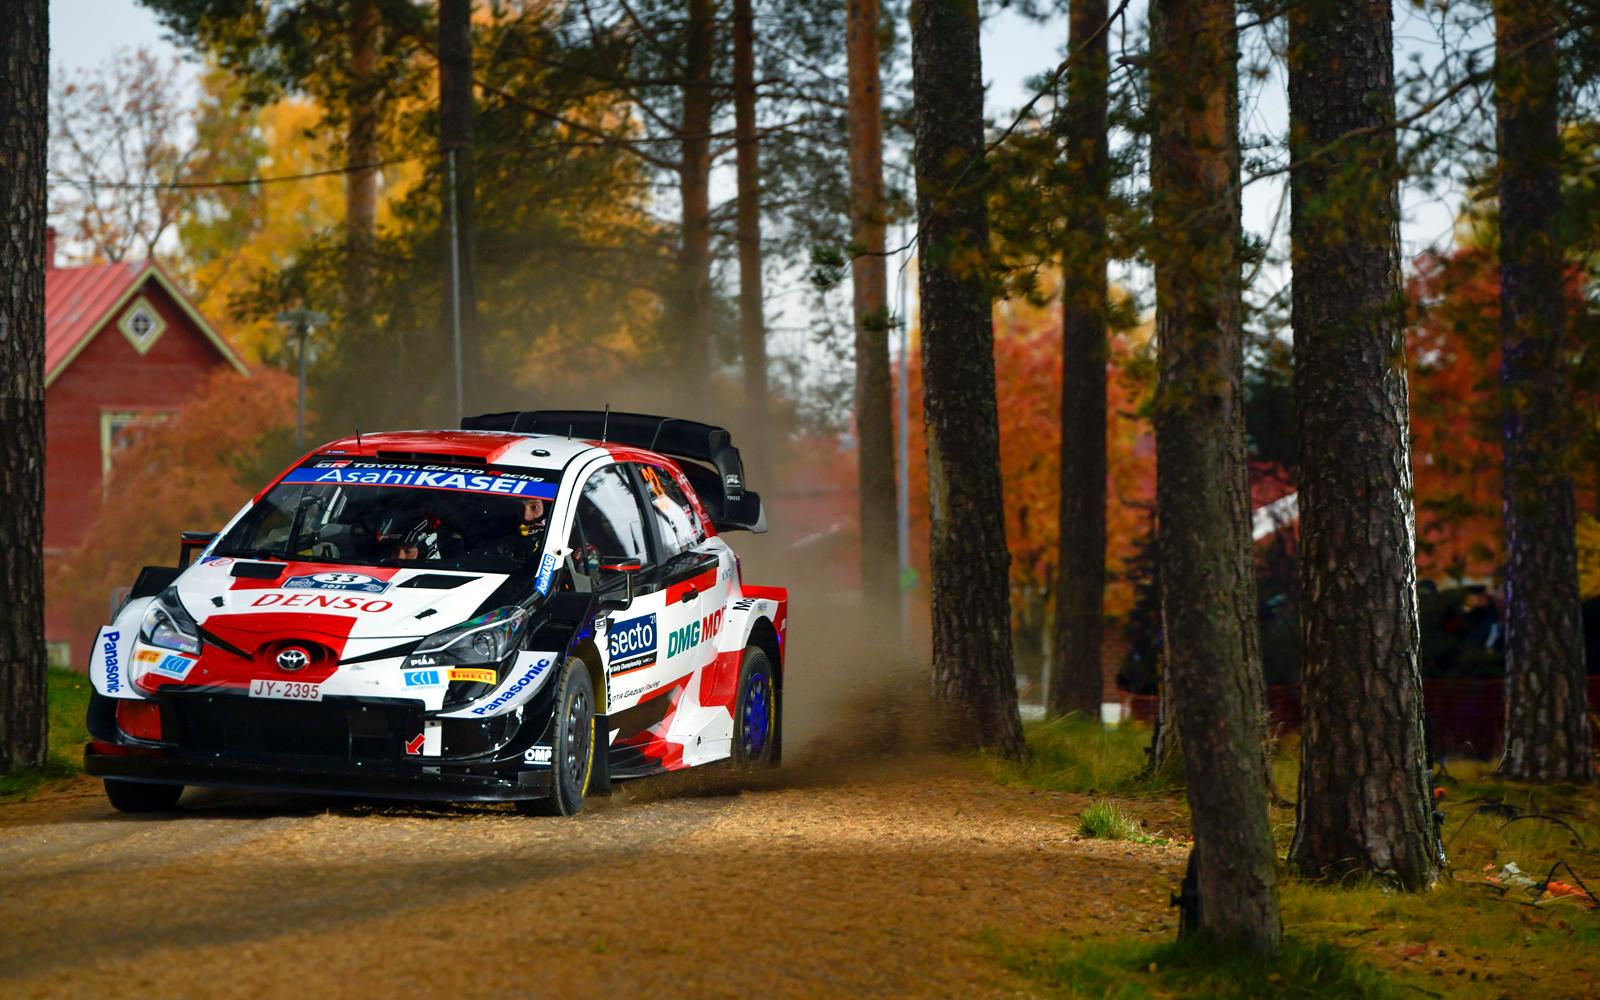 WRC | RD10 - RALLY FINLAND 2021 | LEG 3